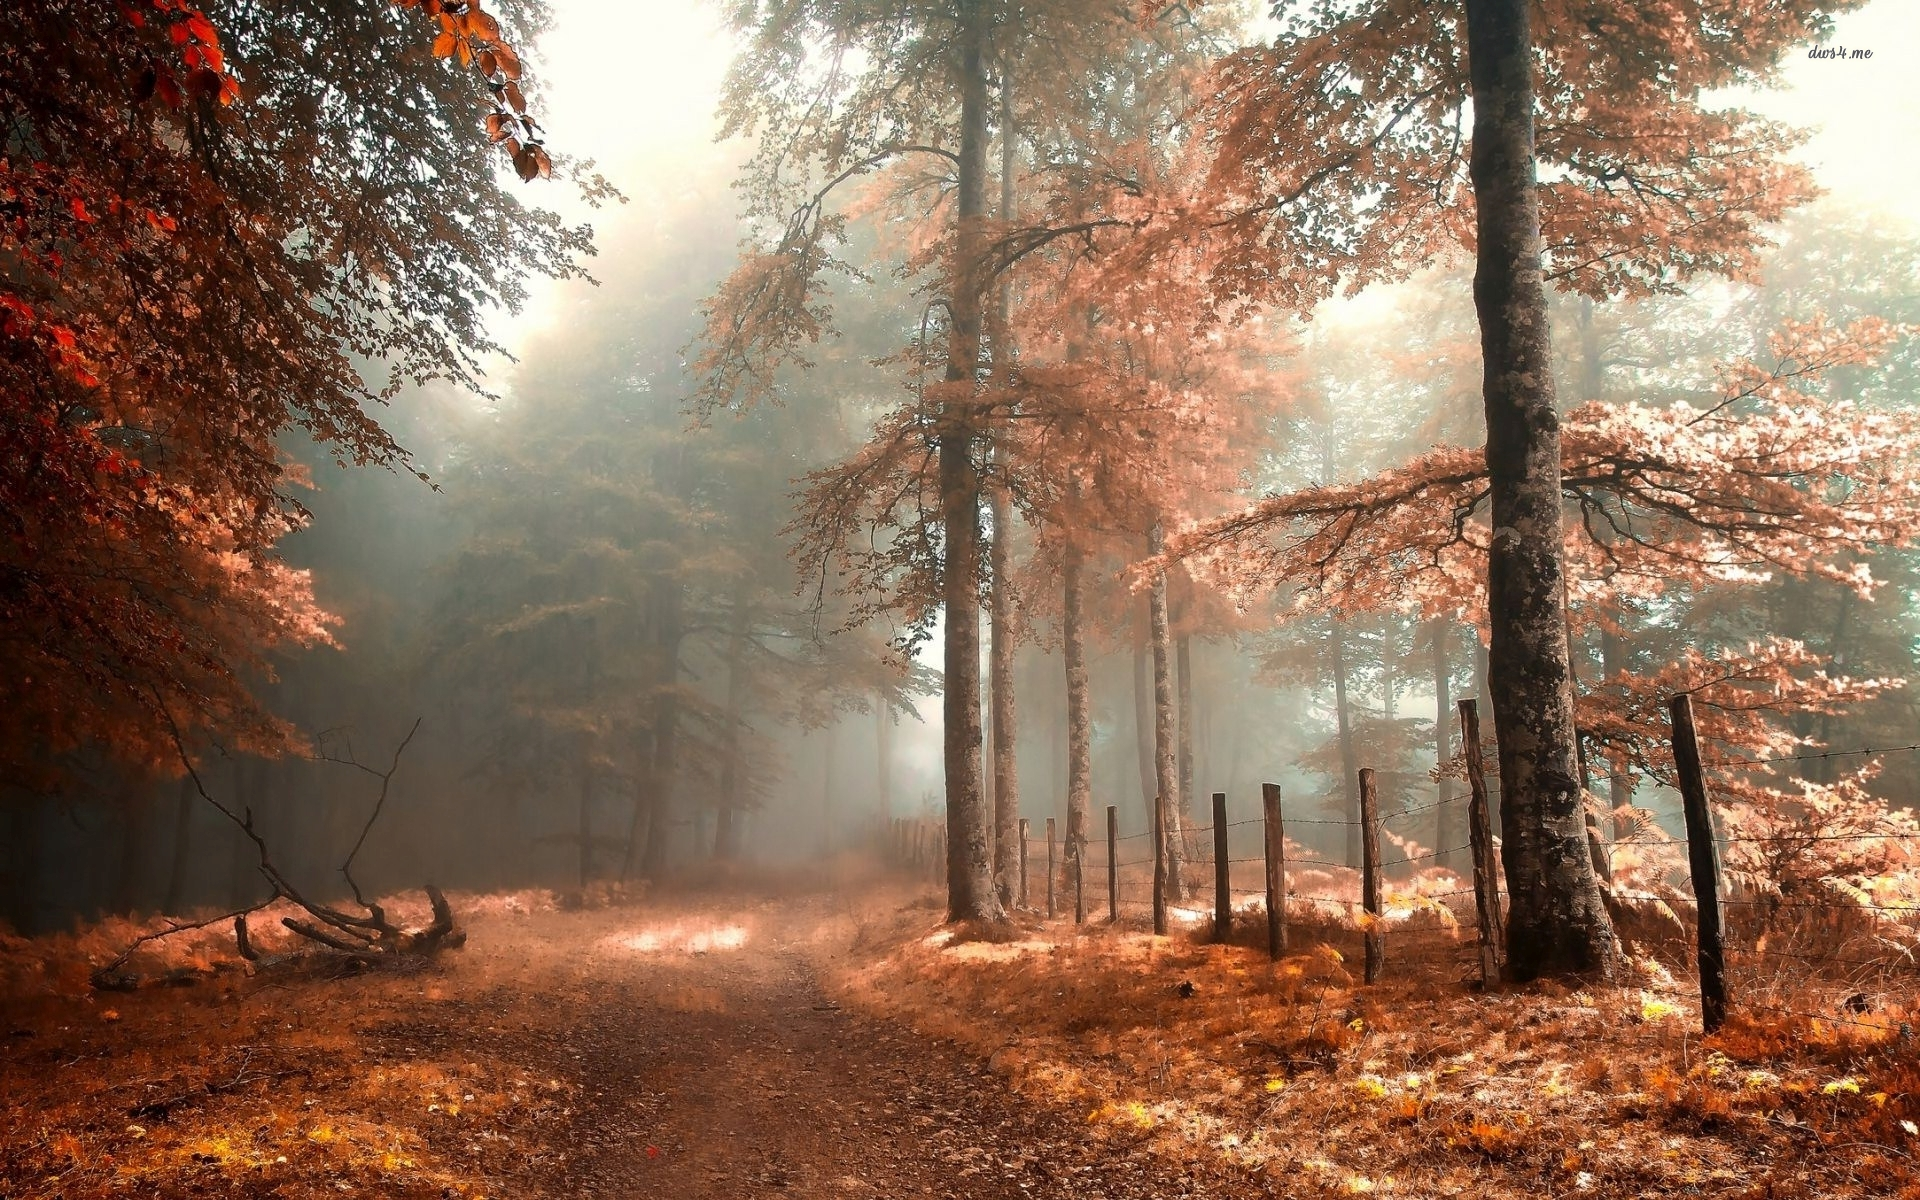 Autumn Nature Widescreen Wallpaper And Background Autumn